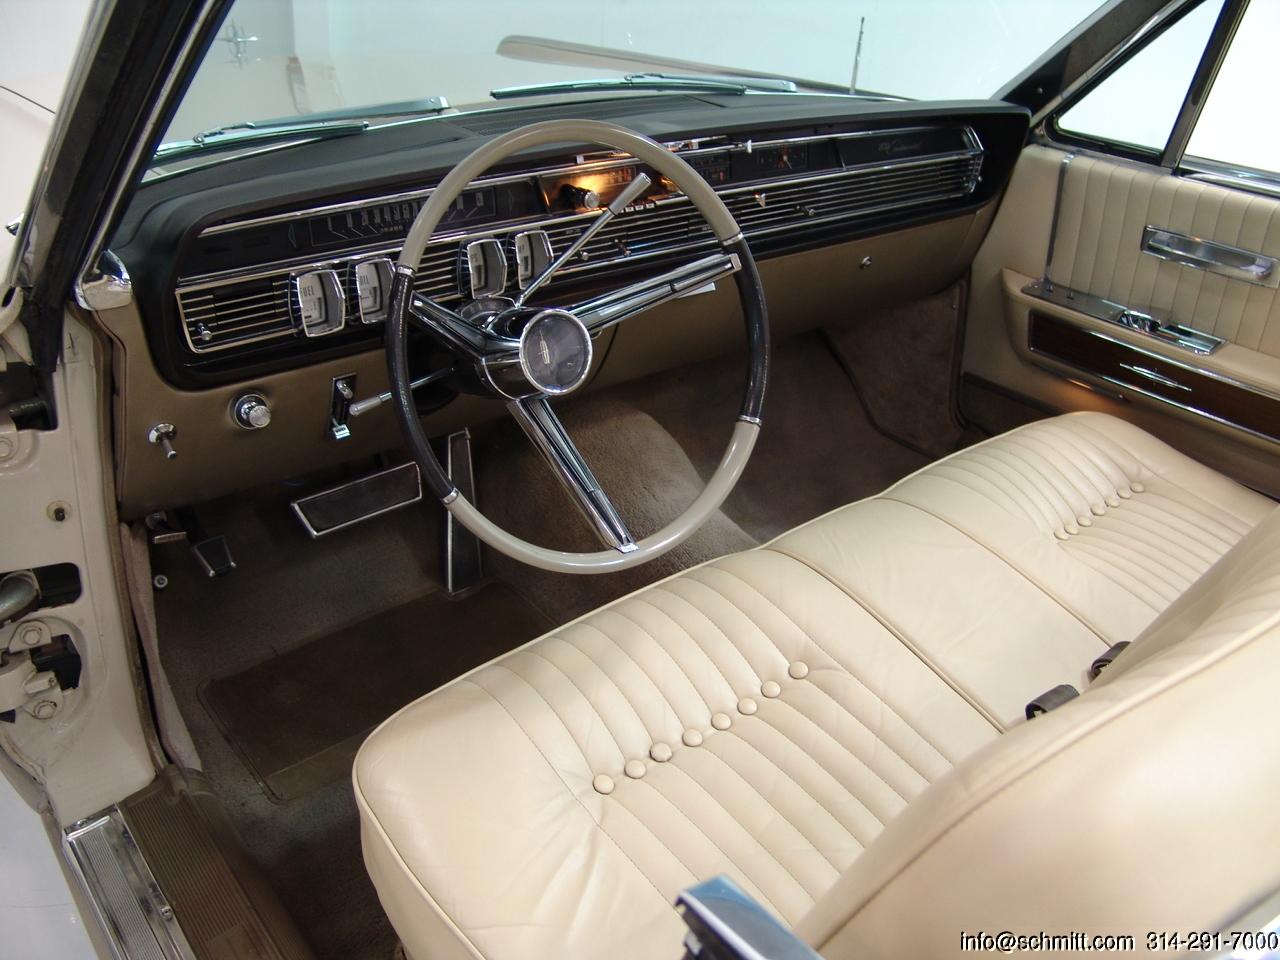 1964 Lincoln Continental 4 Door Convertible Daniel Schmitt Company